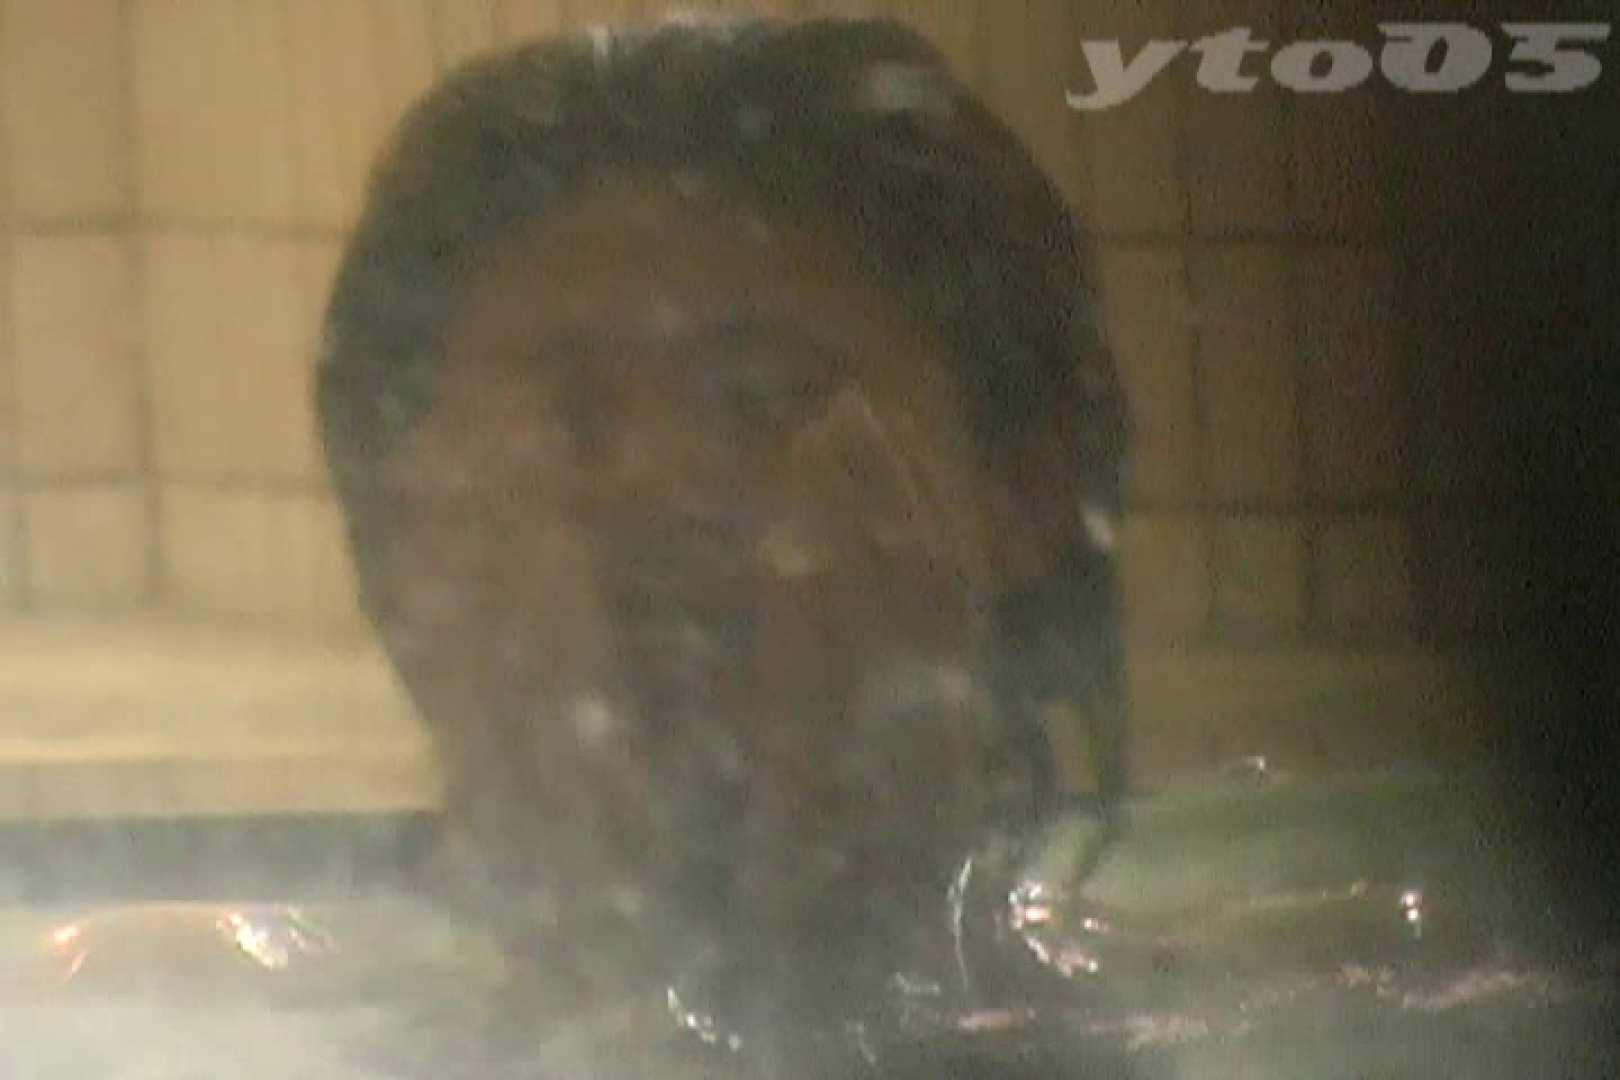 ▲復活限定▲合宿ホテル女風呂盗撮 Vol.28 OL | 合宿  38連発 15